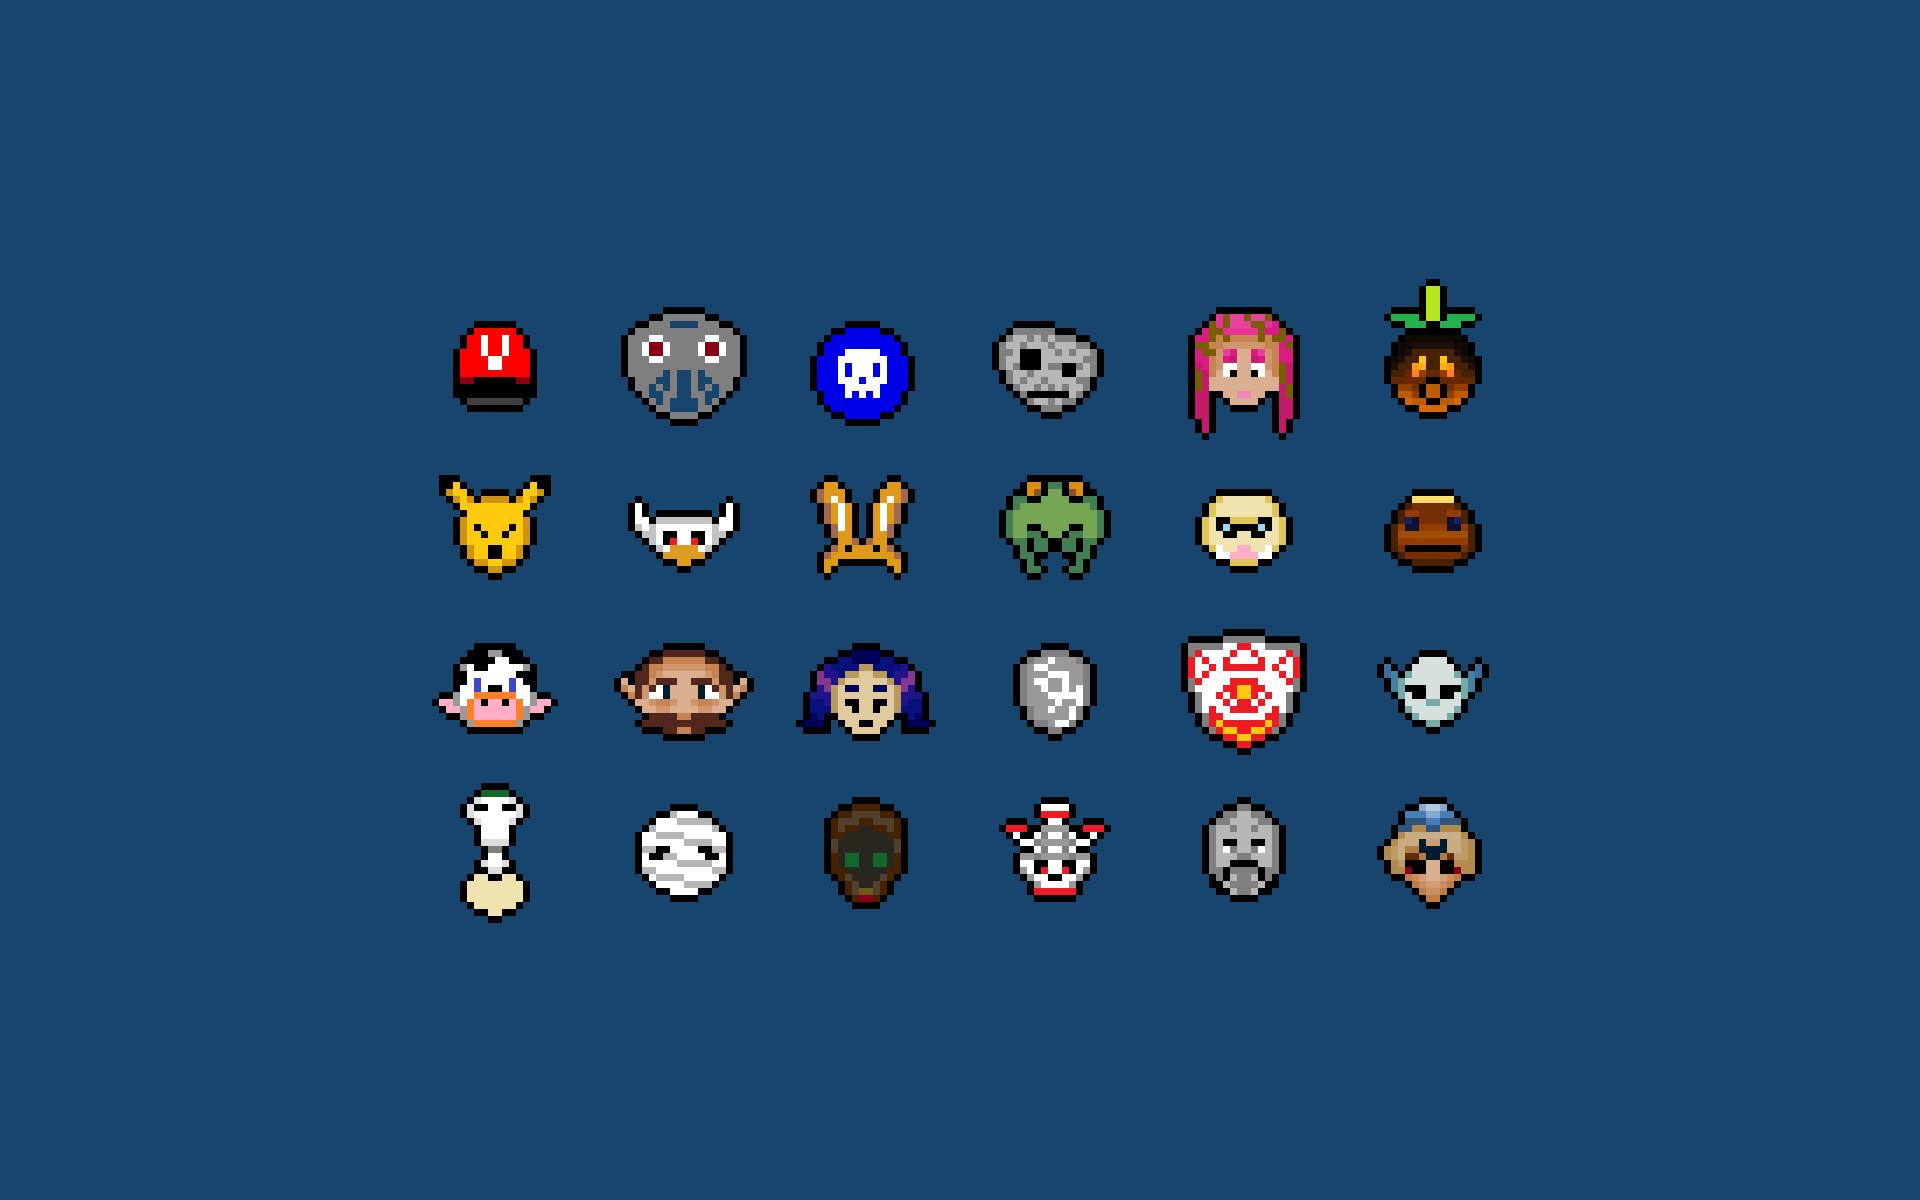 Shovel Knight, Video Games, Pixel Art, Retro Games, 8 bit, 16